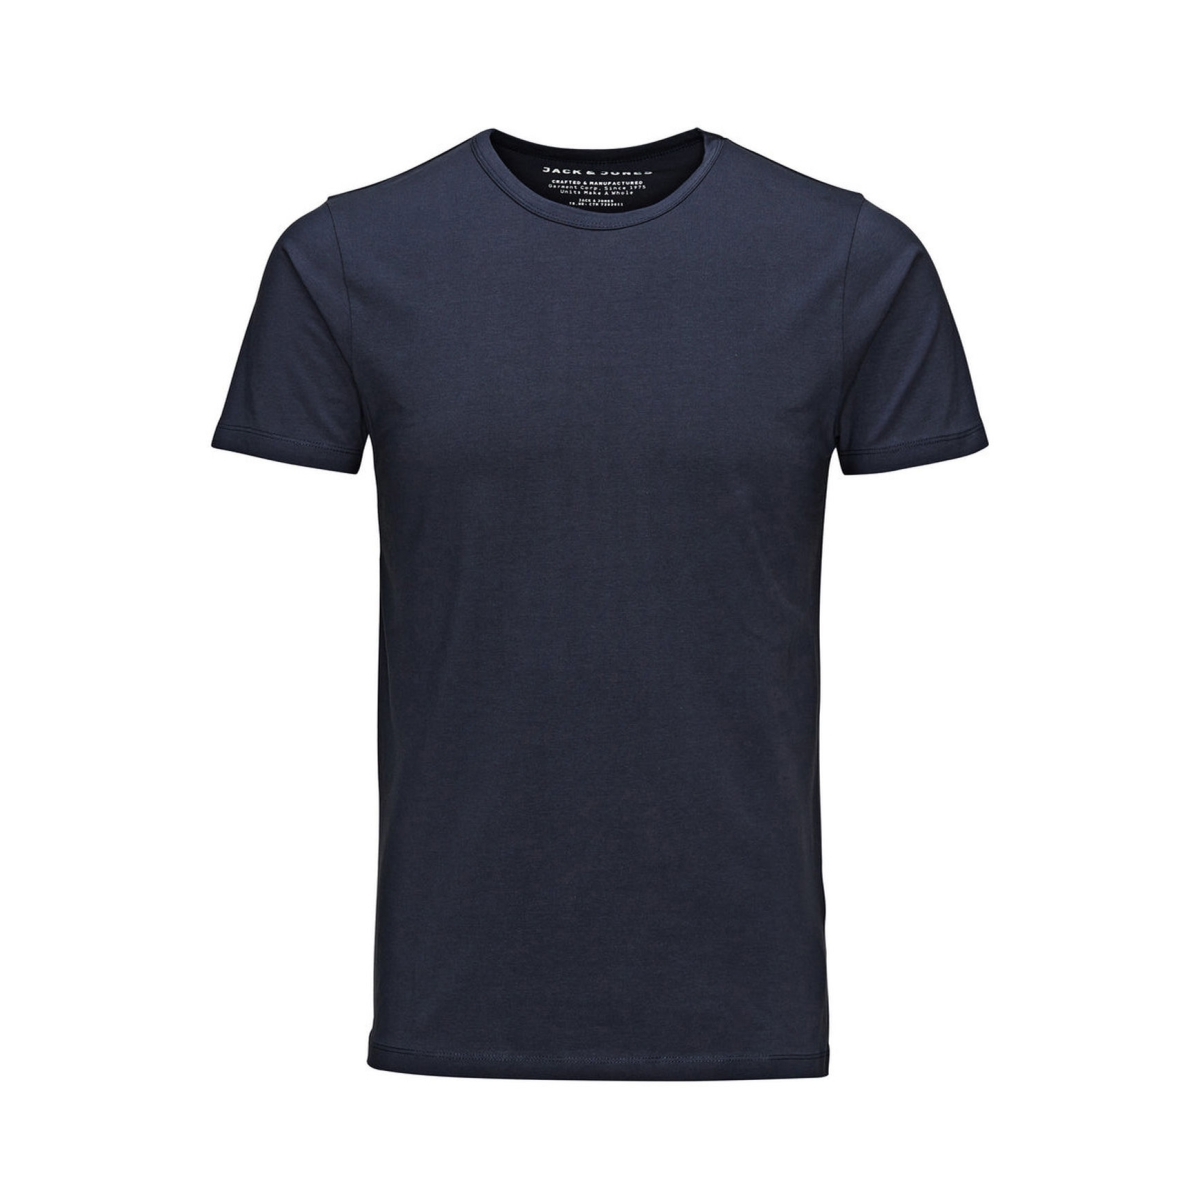 basic o-neck tee 12058529 jack & jones t-shirt navy blue